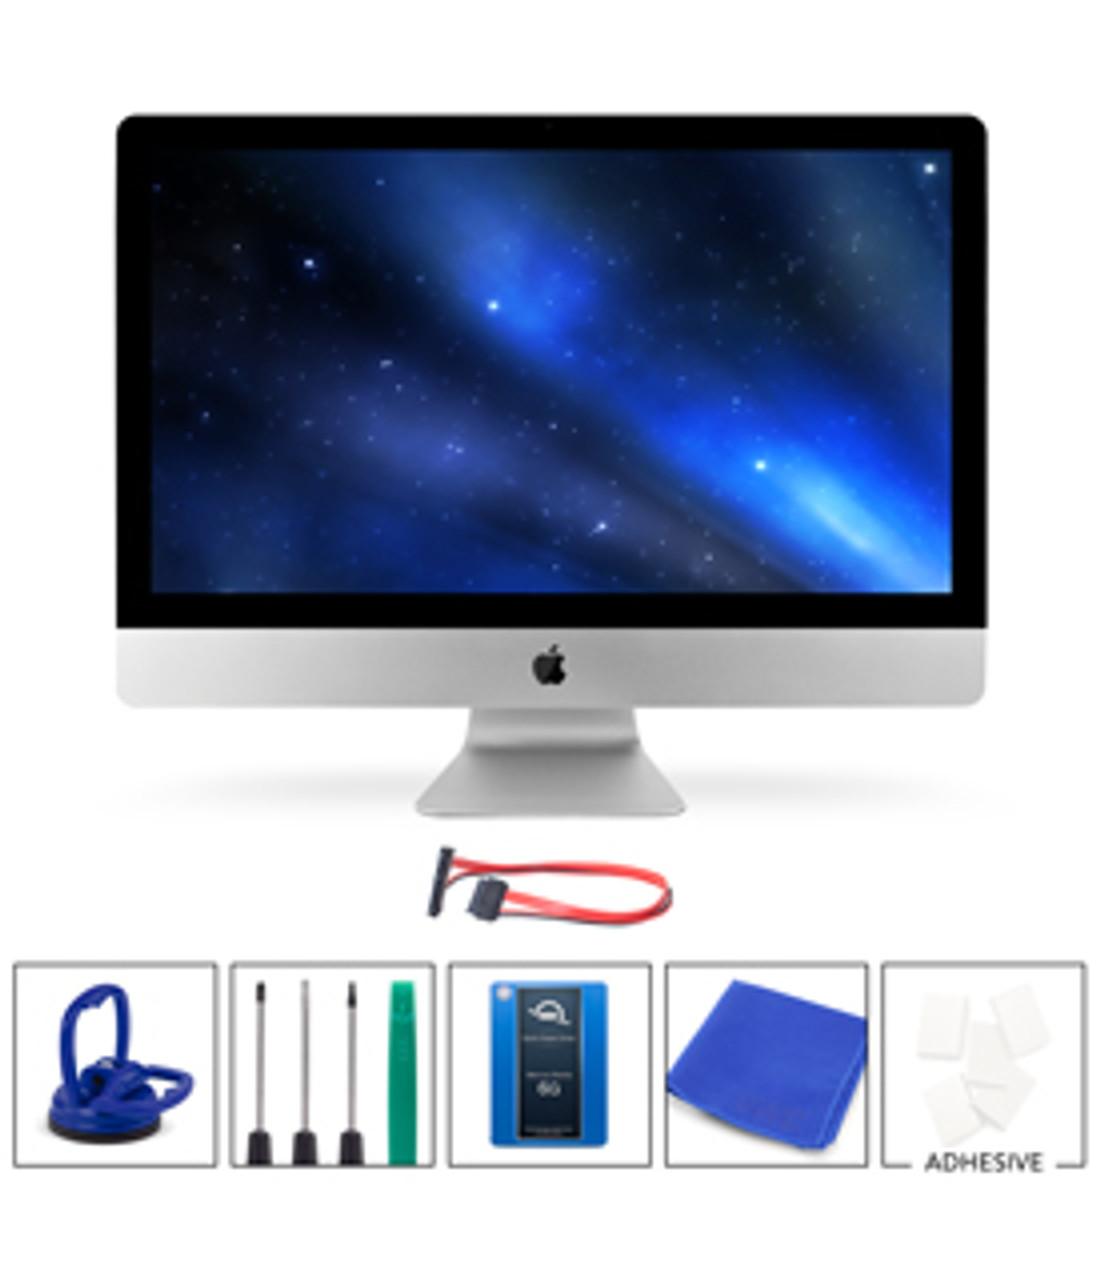 1TB OWC Mercury Electra 6G SSD - SSD Bay Add-In Kit for 2011 27-inch iMacs